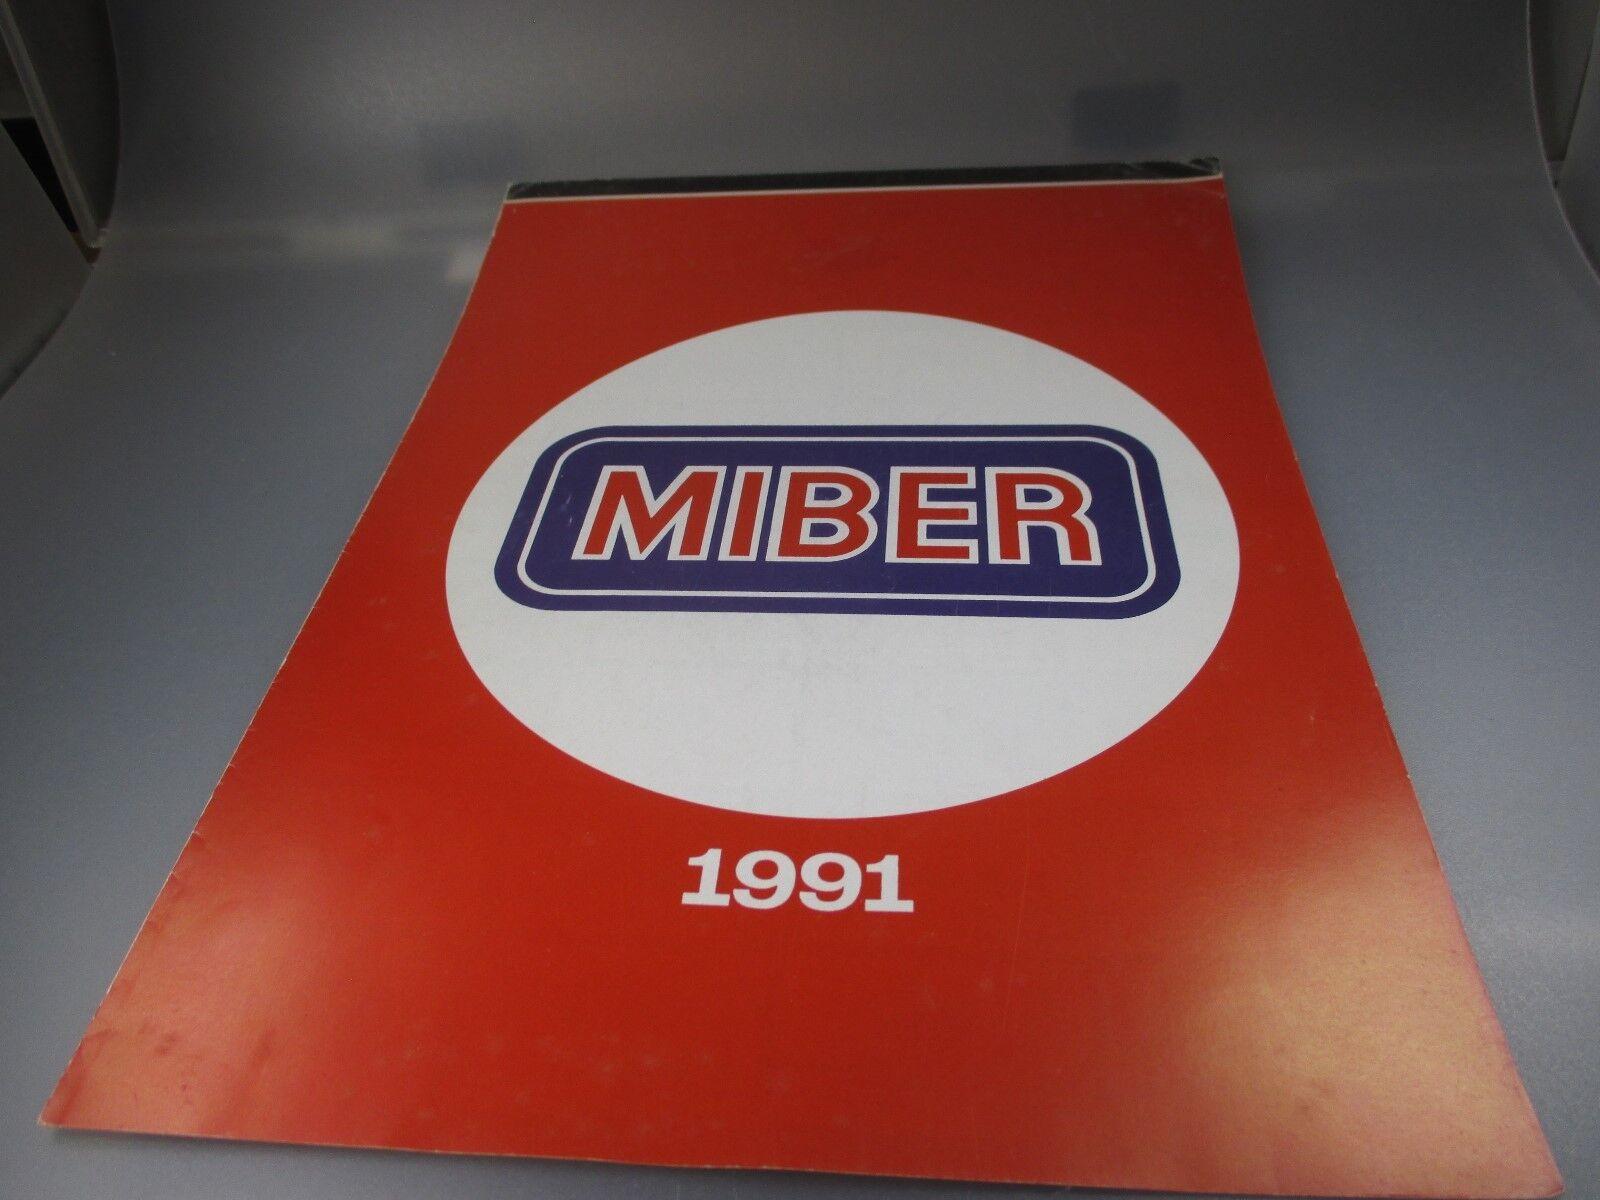 Miber : Gesamt-Program 1991, Rari Brochure Der Gesuchten 1:87 Modelli (GK76)